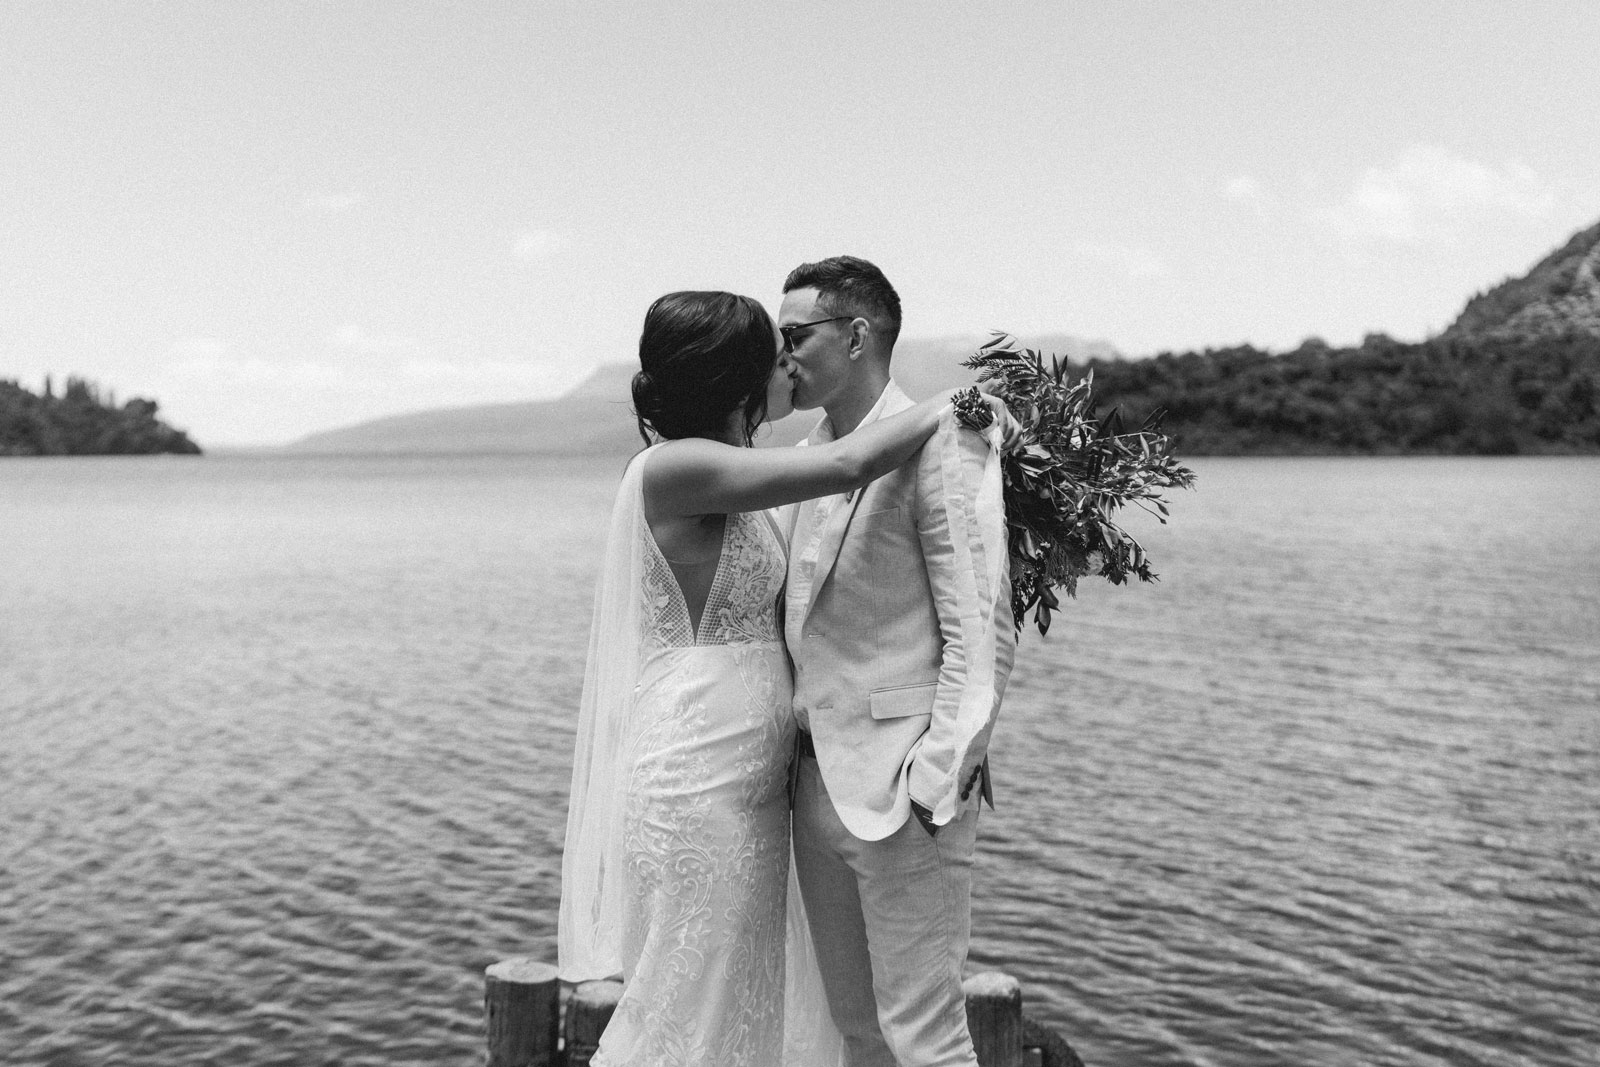 newfound-n-w-black-barn-tarawera-rotorua-wedding-photographer-261A